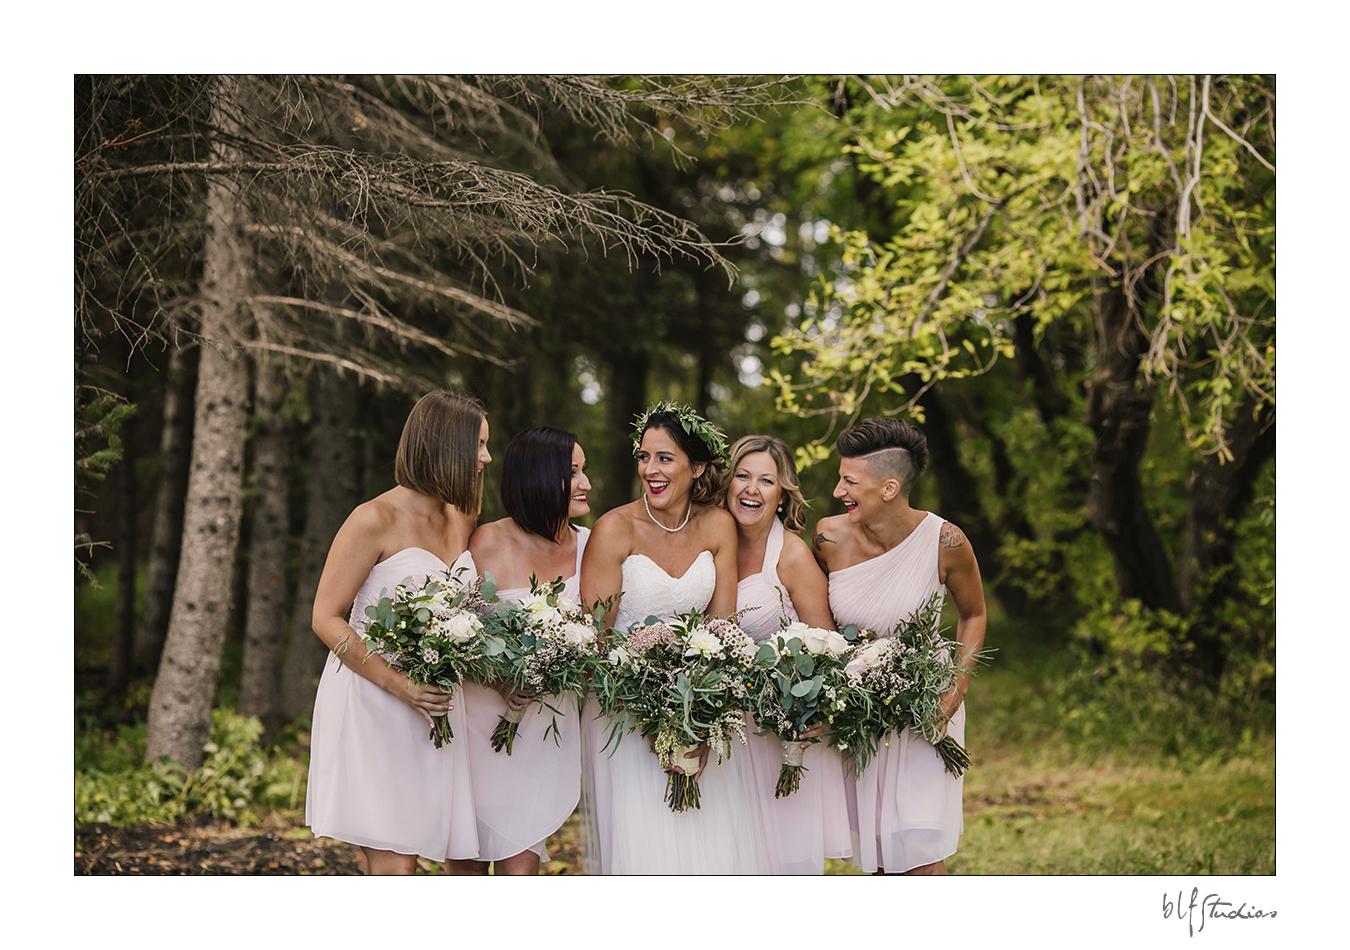 018-winnipeg-hitchnpost-wedding-marla-alana.jpg